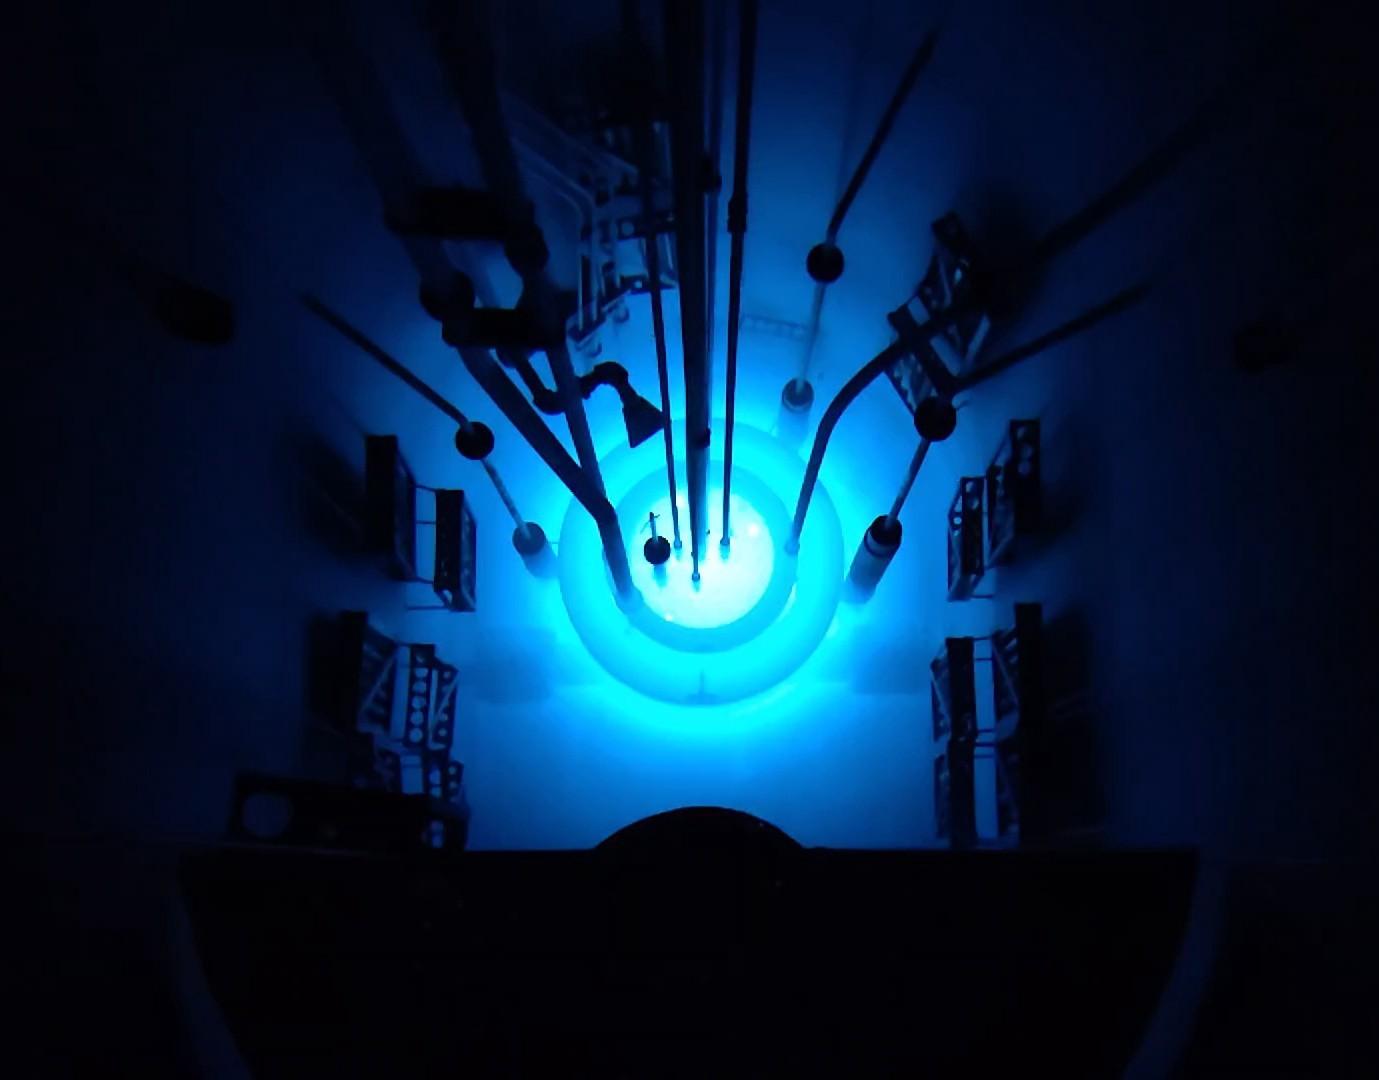 Рис. 1. Реактор TRIGA на полной мощности.